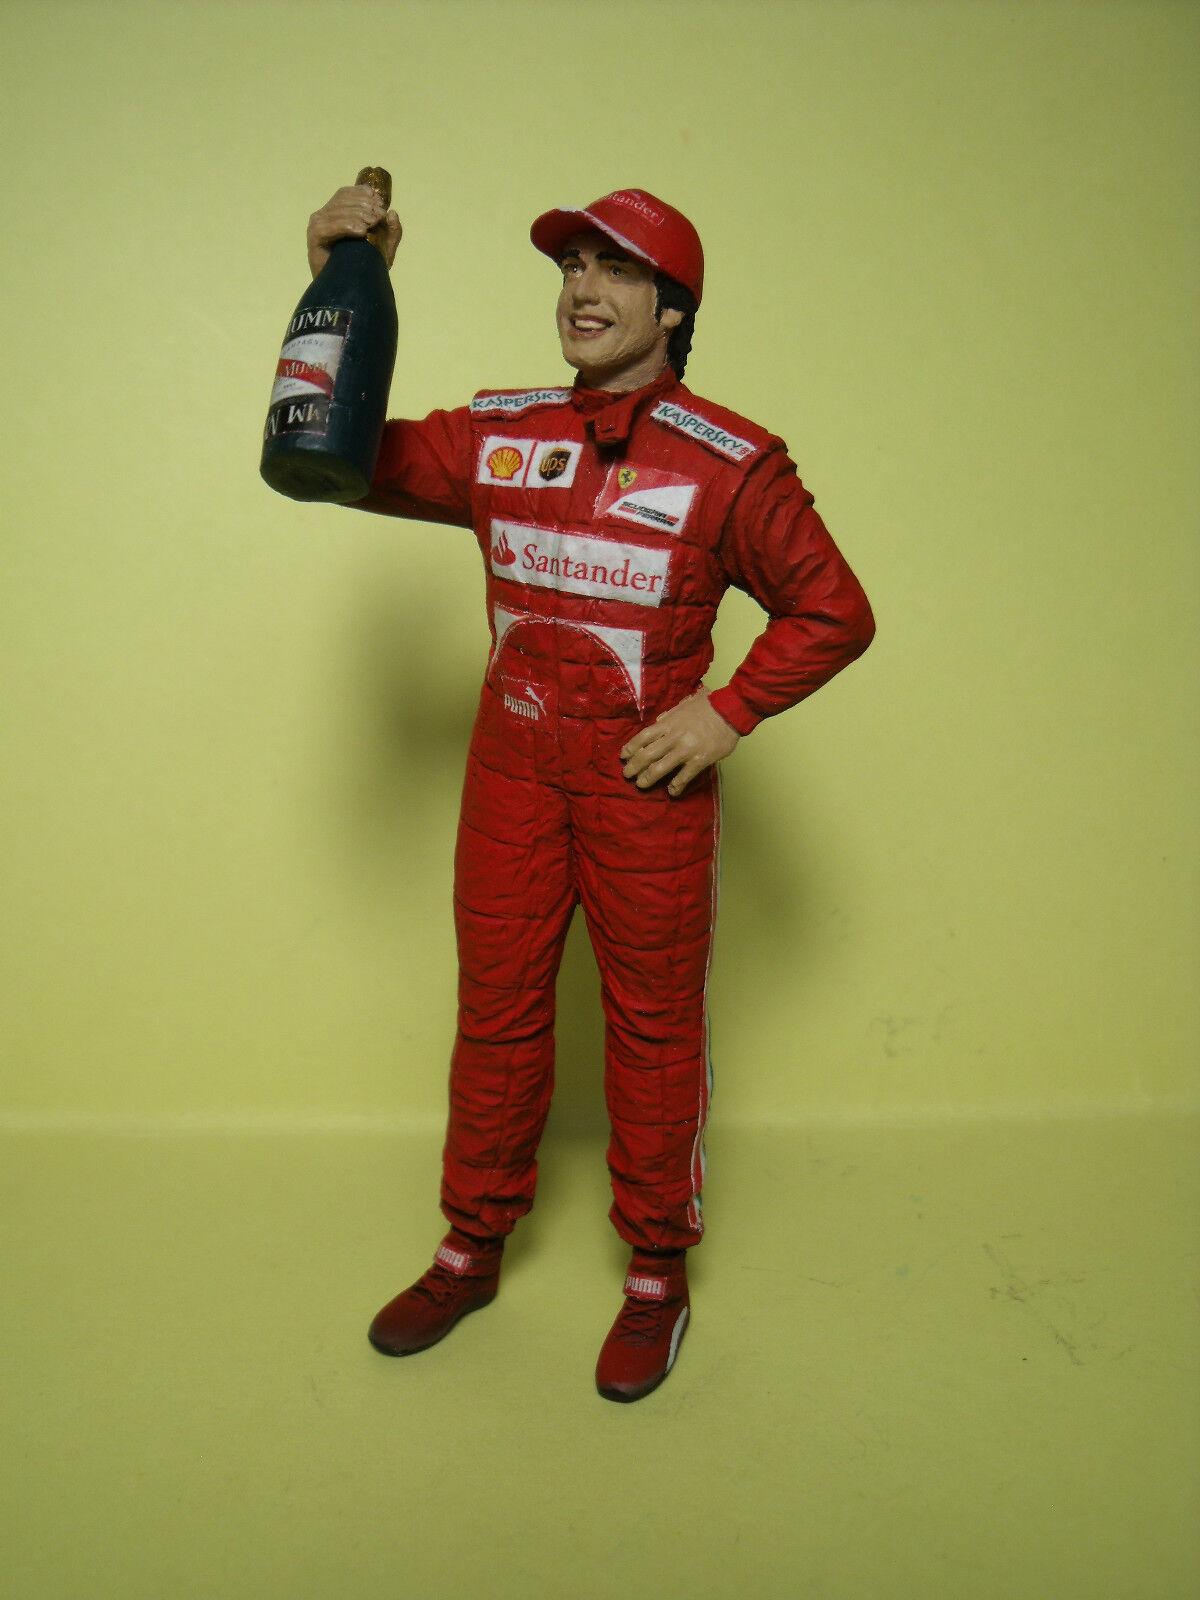 Fernando Alonso 1 1 1 18 Sin Pintar Figura Hecha Por brooom No Minichamps 31ba97